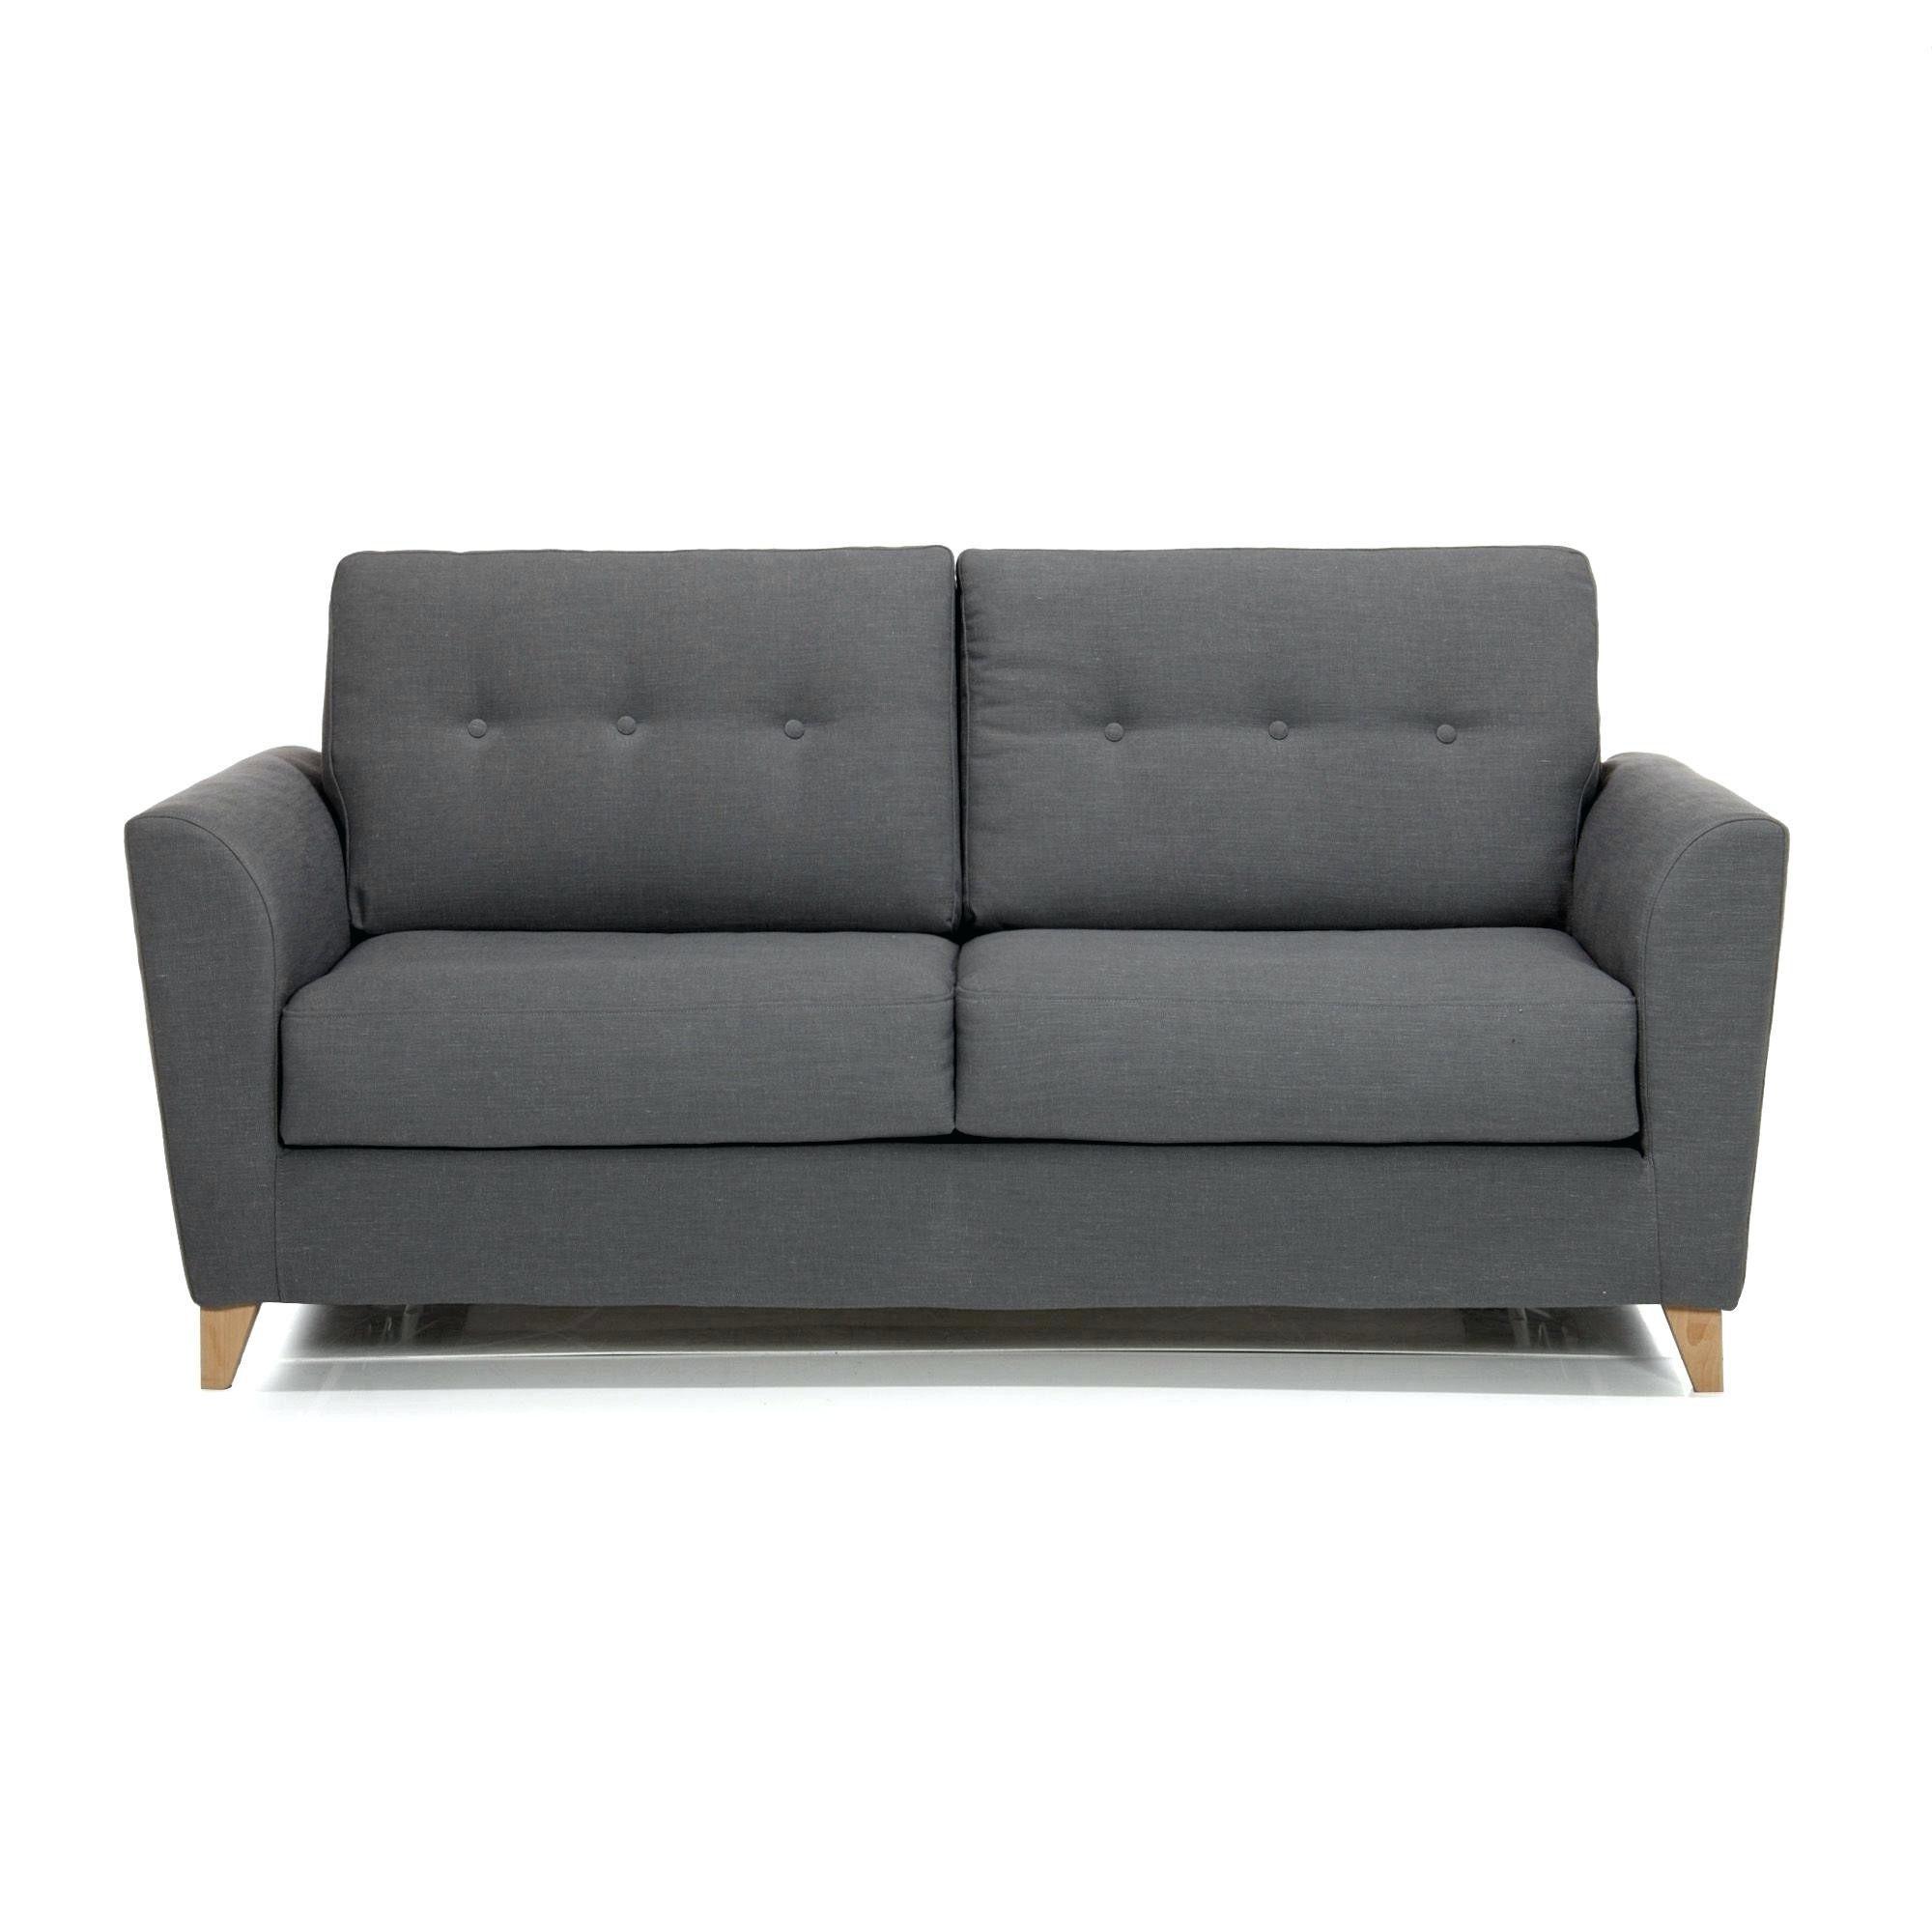 24 Elegant Ikea Bed assembly Instructions